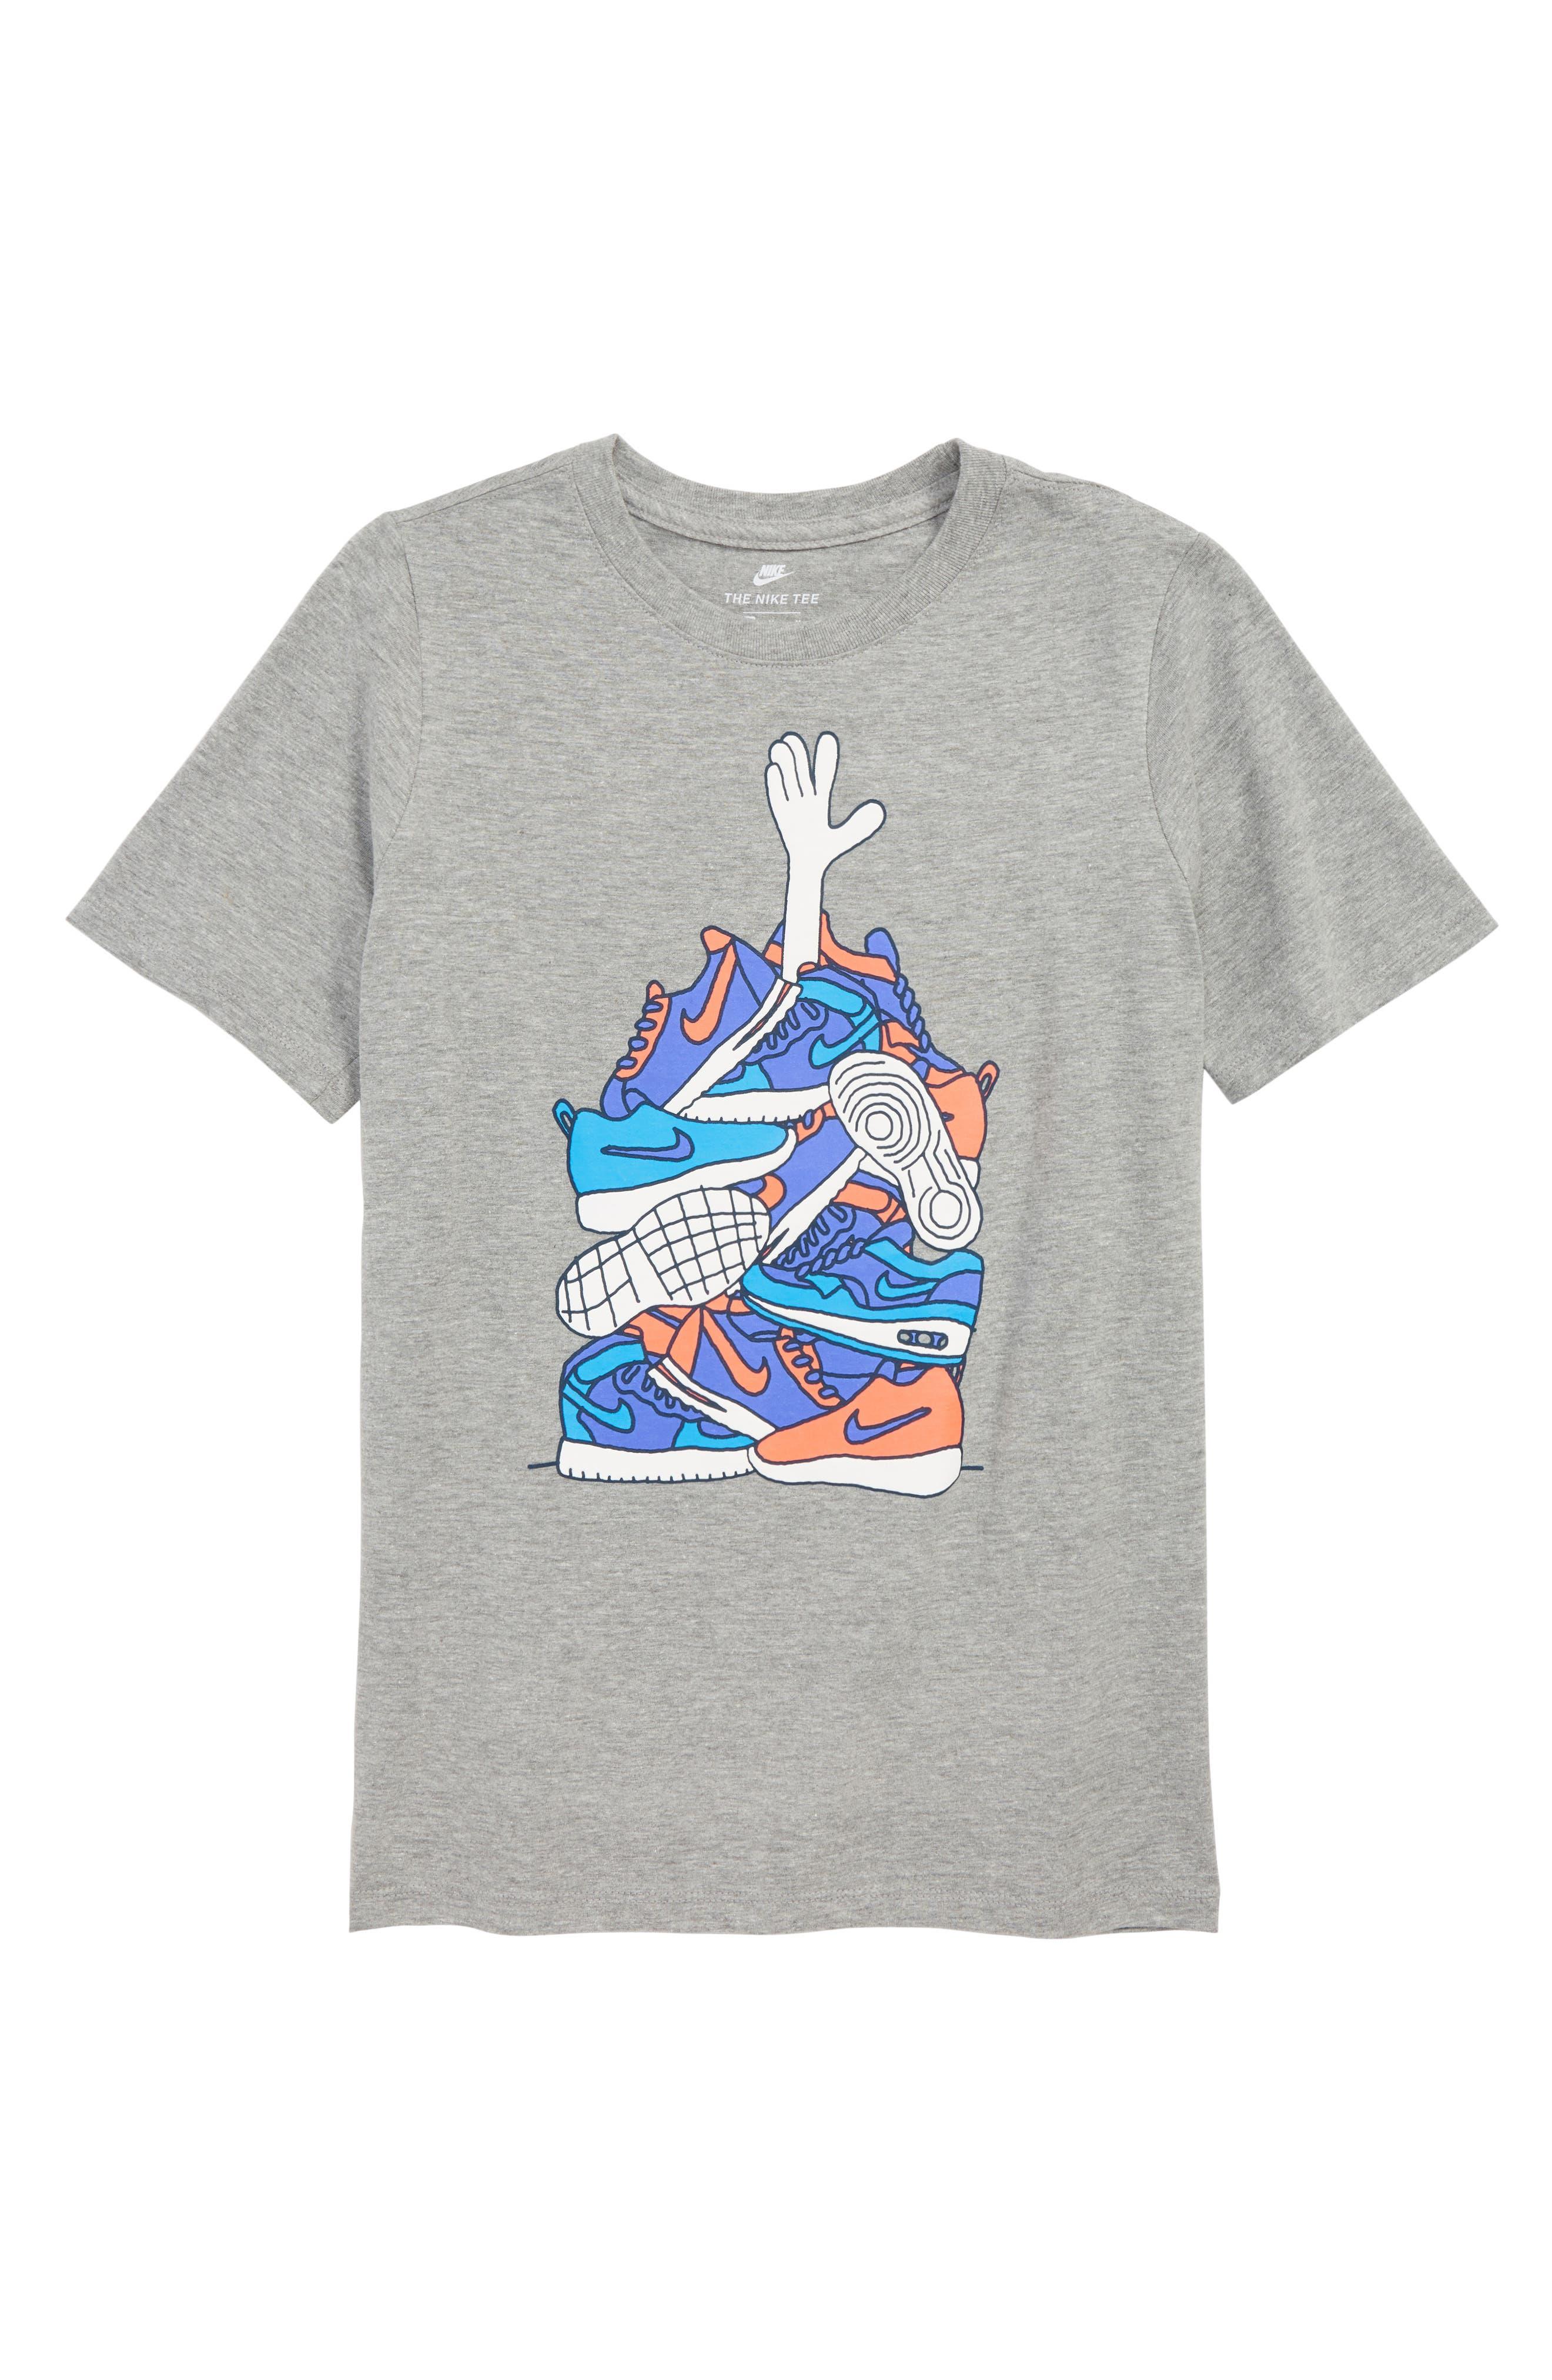 Sneaker Pile Graphic T-Shirt,                         Main,                         color, 063